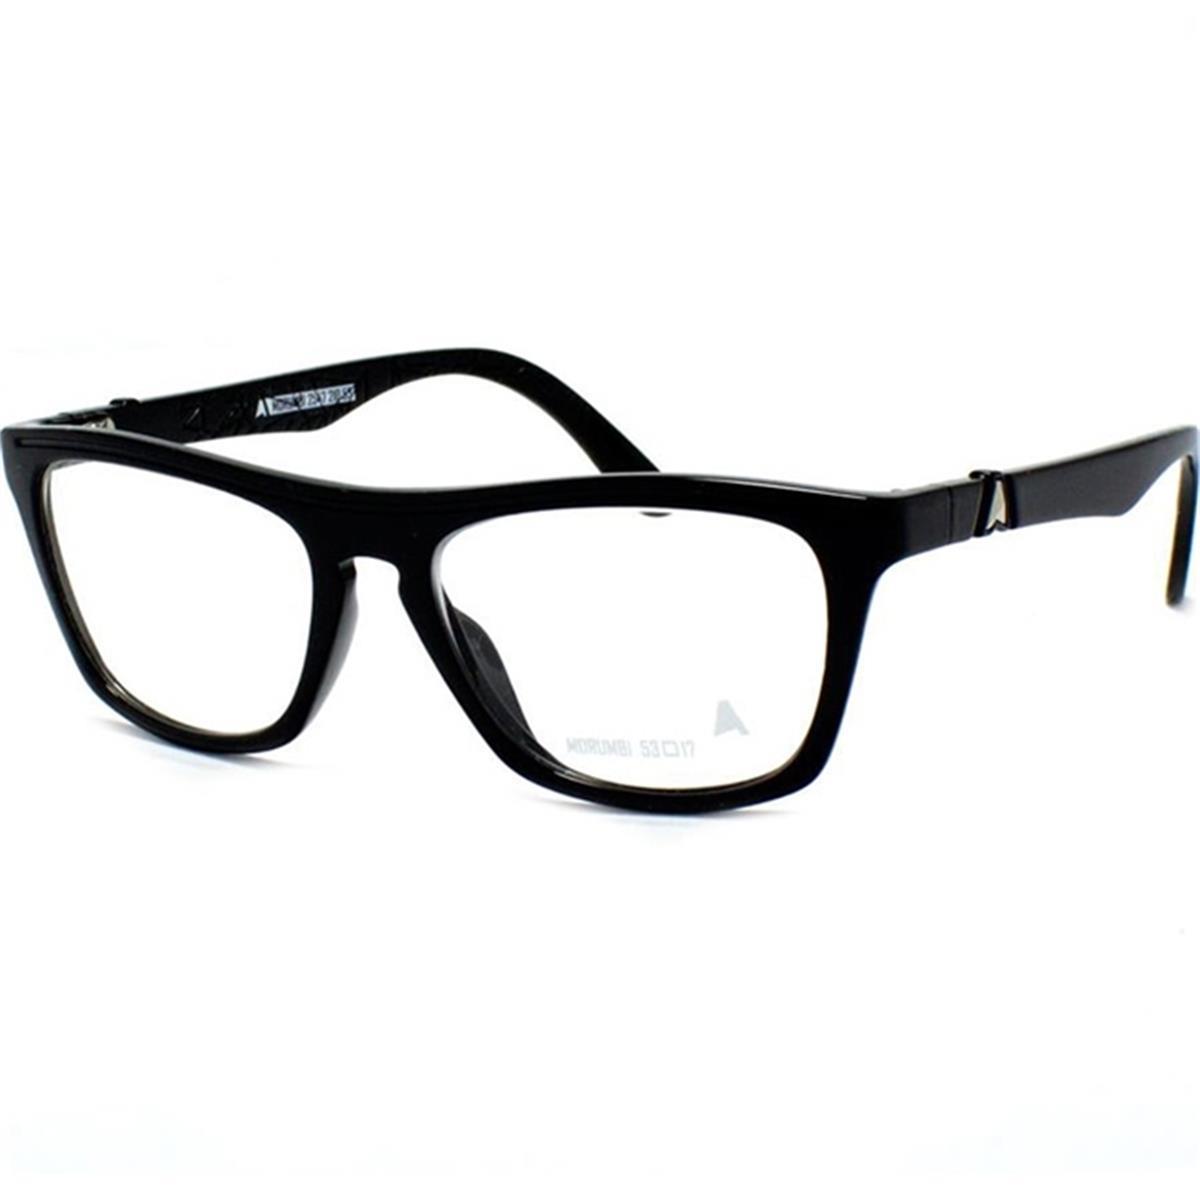 8ba4ca7a1 Armação para Óculos de Grau Unissex Retrô Morumbi Absurda